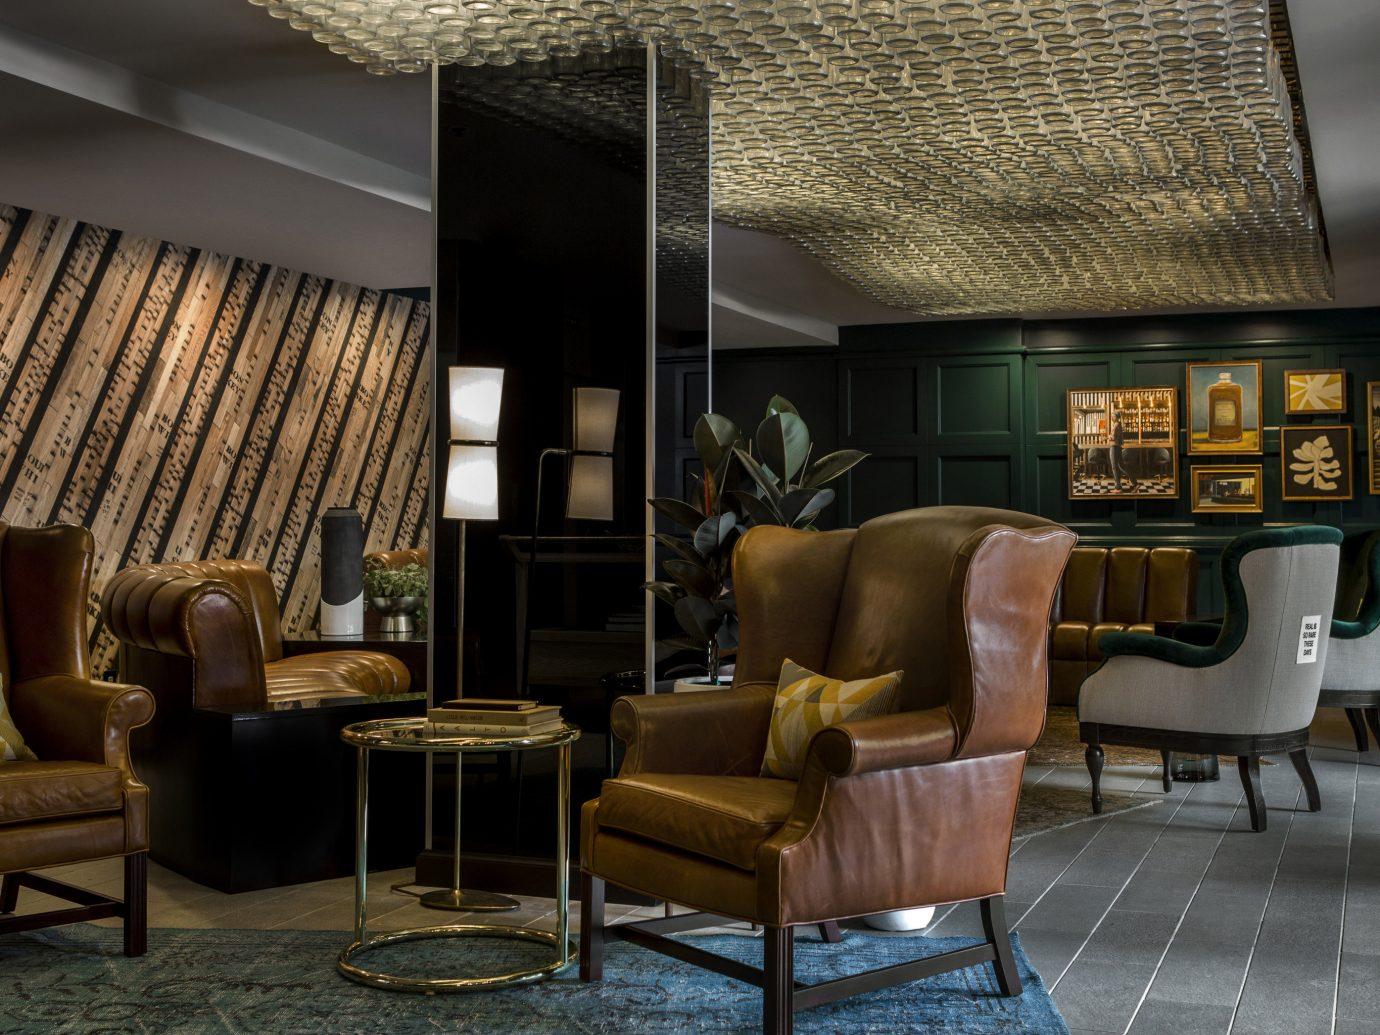 Hotels floor Living room indoor sofa chair living room property furniture Lobby ceiling interior design home Design condominium estate area window covering leather several